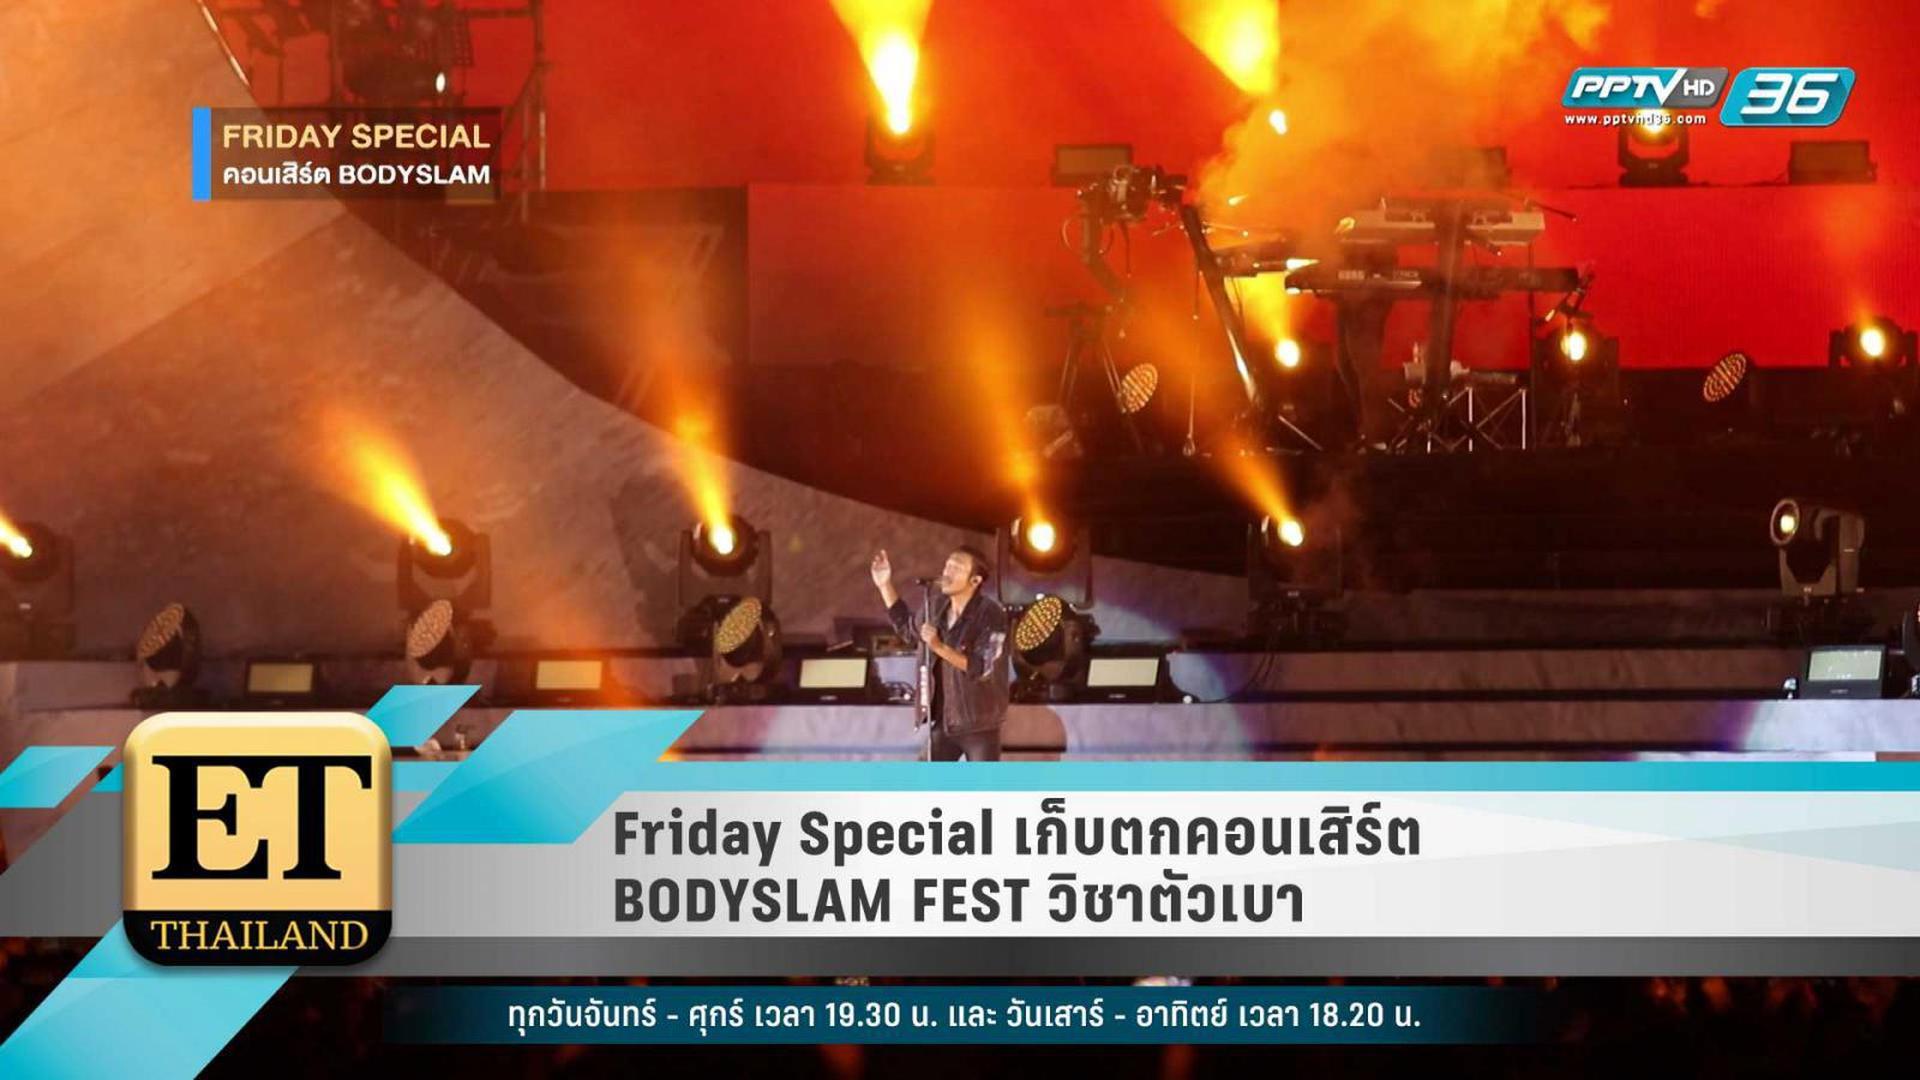 Friday Special เก็บตกคอนเสิร์ต BODYSLAM FEST วิชาตัวเบา